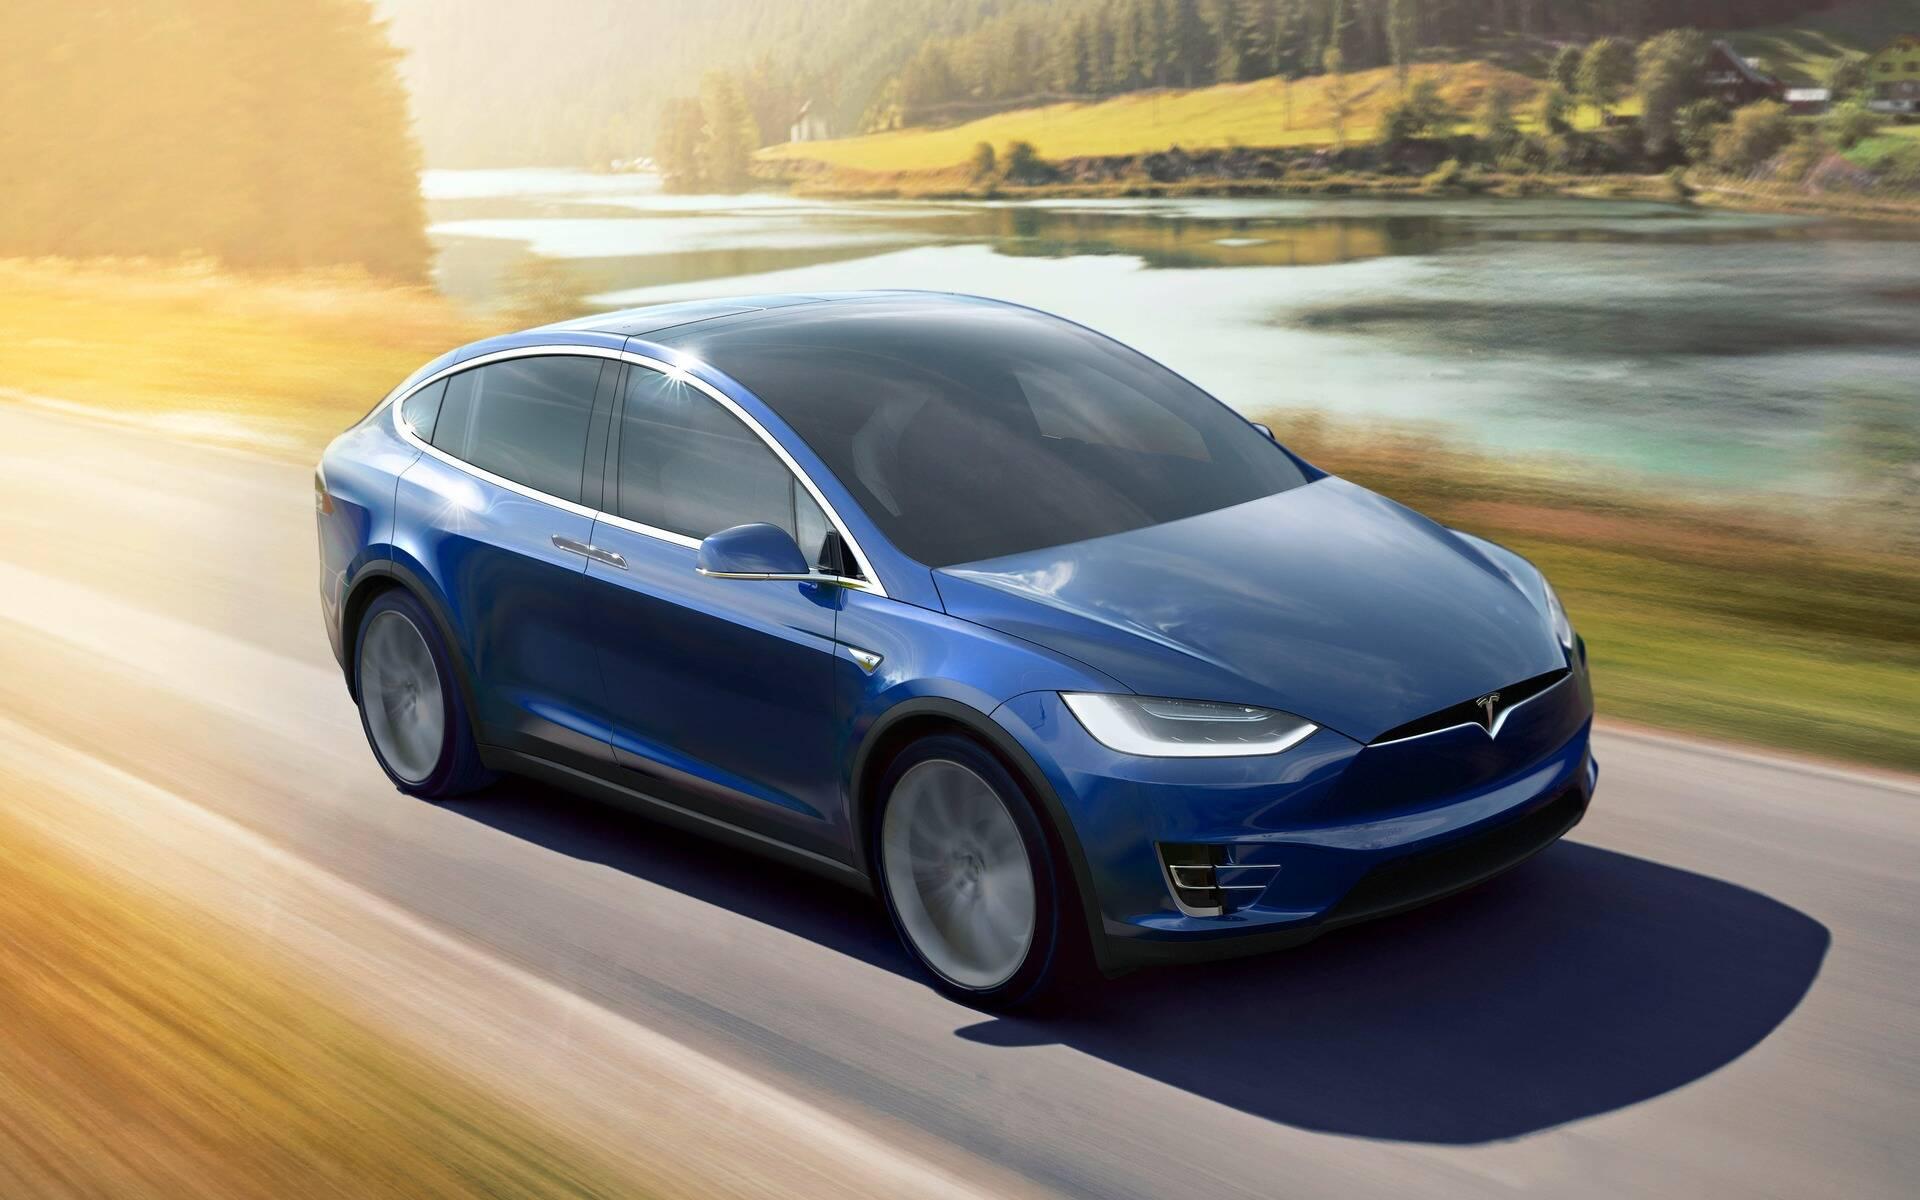 Tesla : la model 3 dévoilée - II - Page 13 402549-2021-tesla-model-x